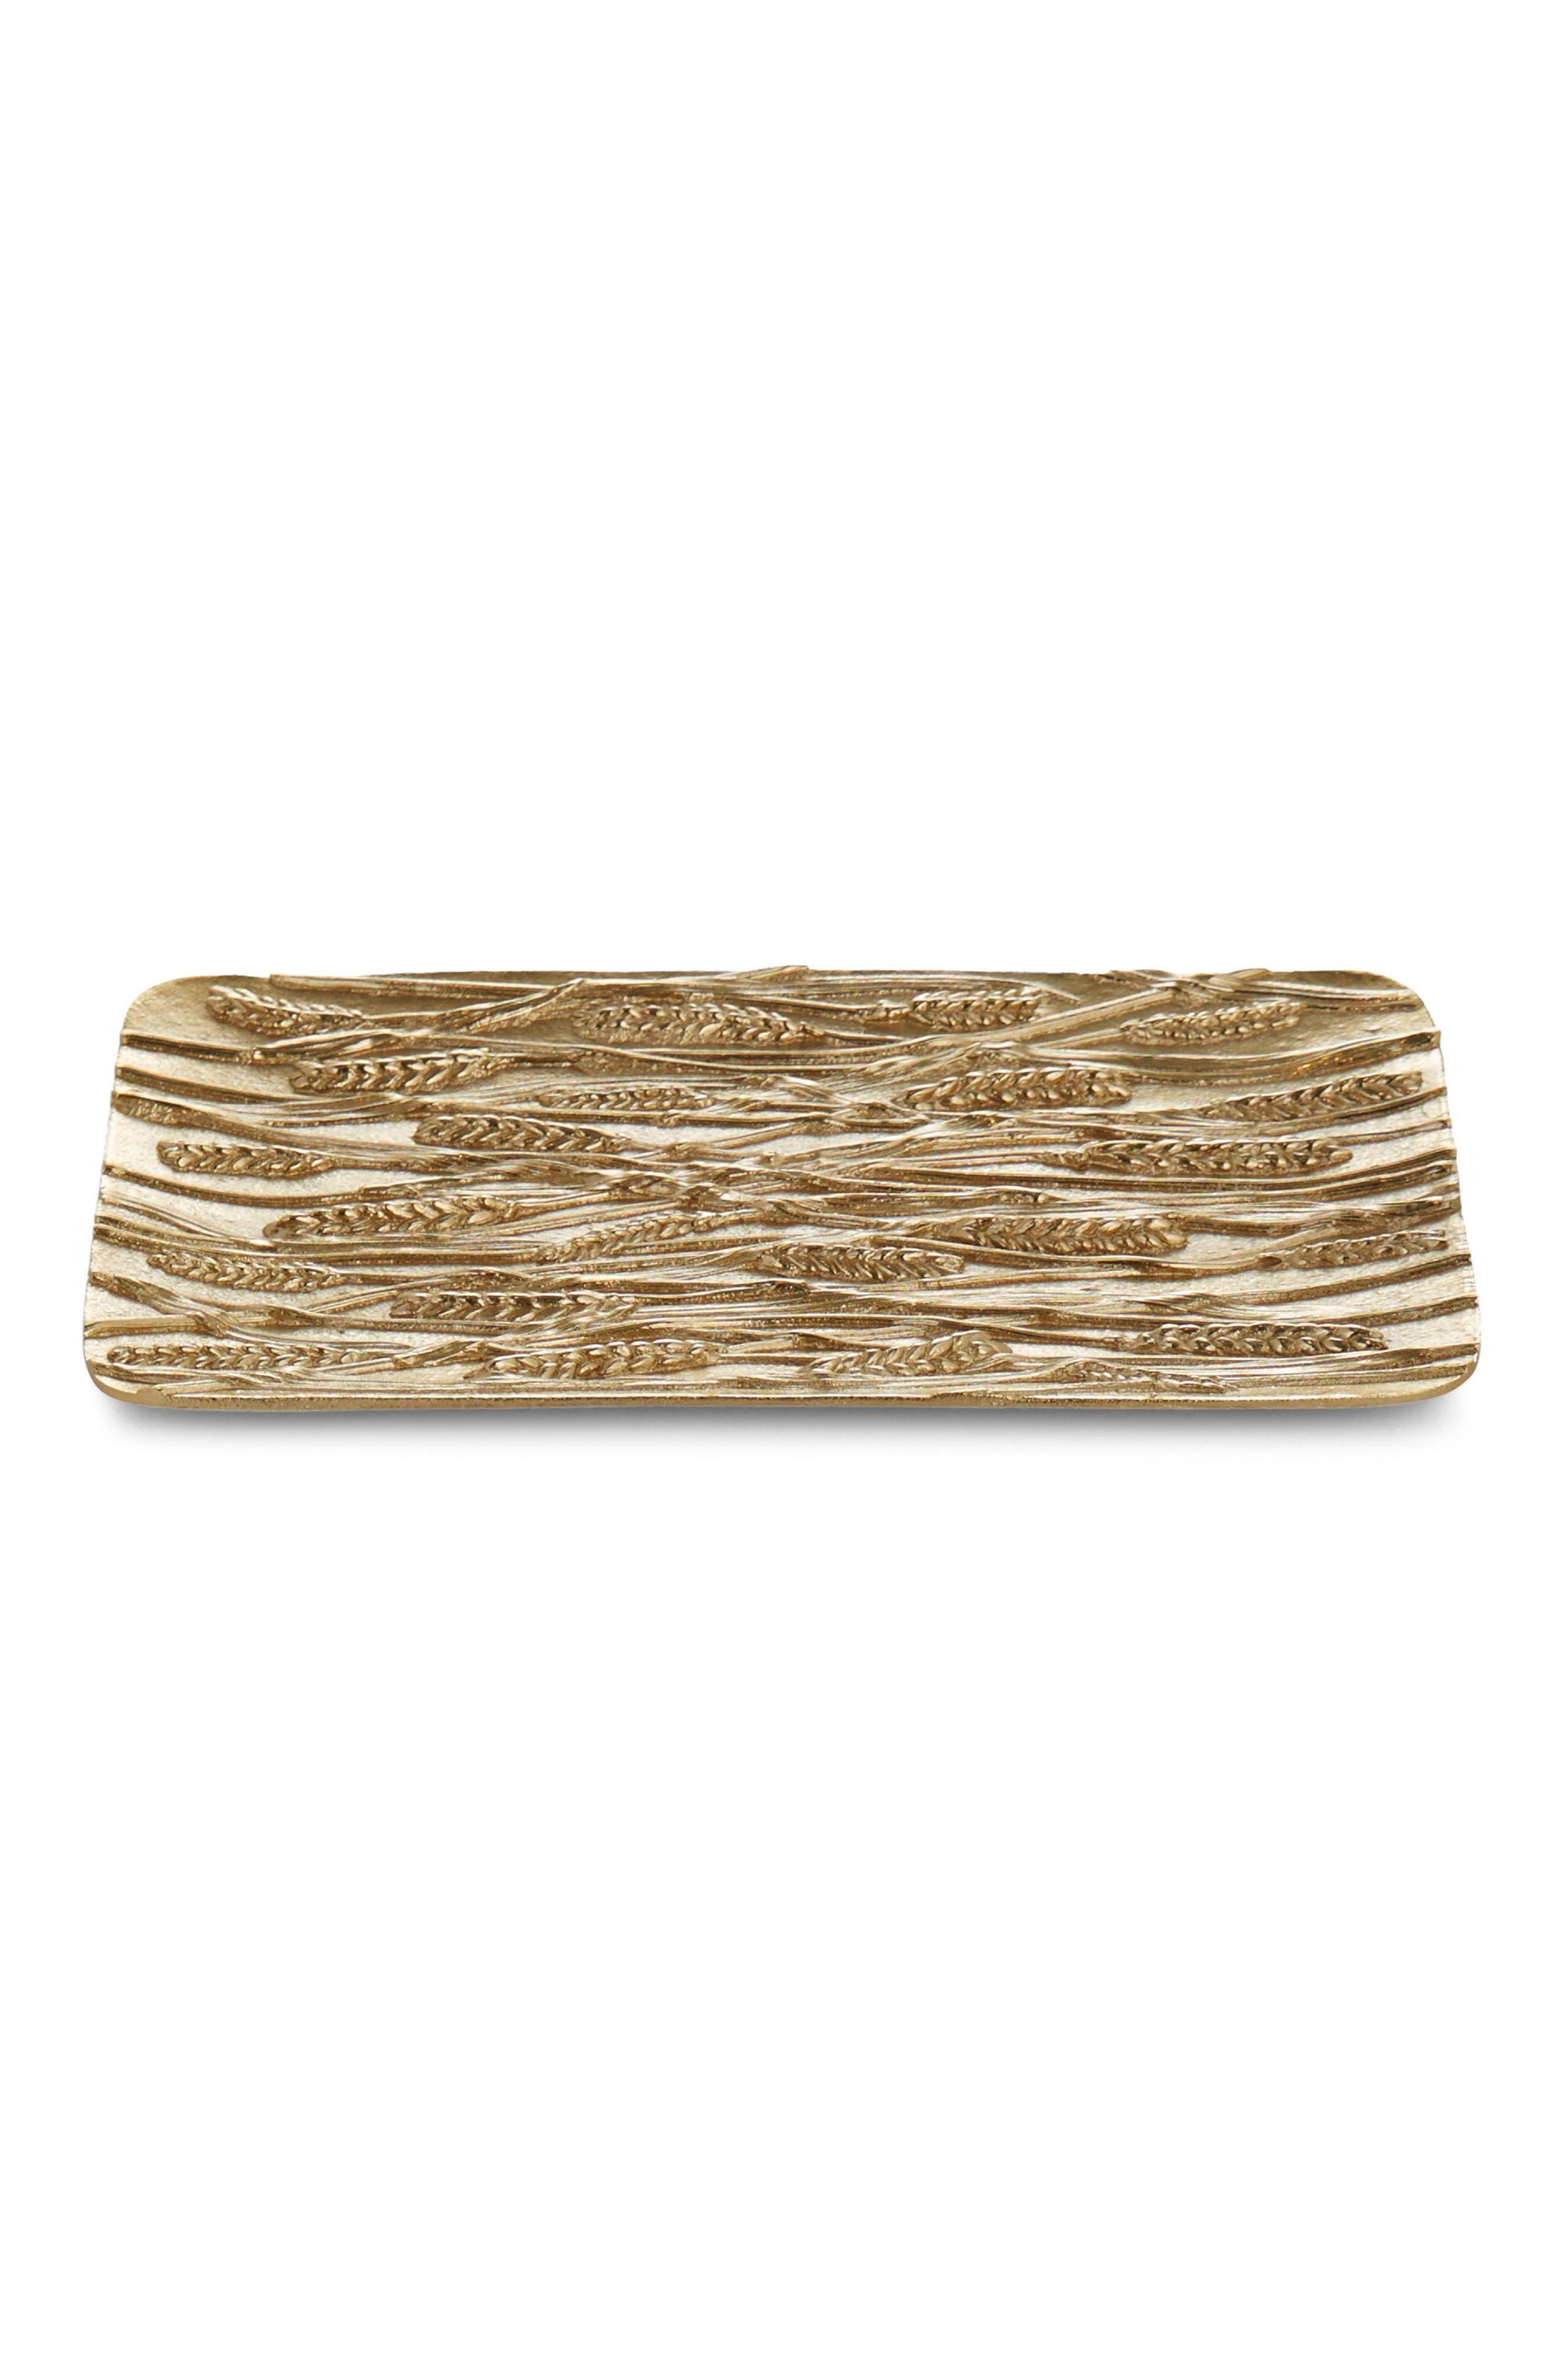 Wheat Bread Plate,                             Main thumbnail 1, color,                             710